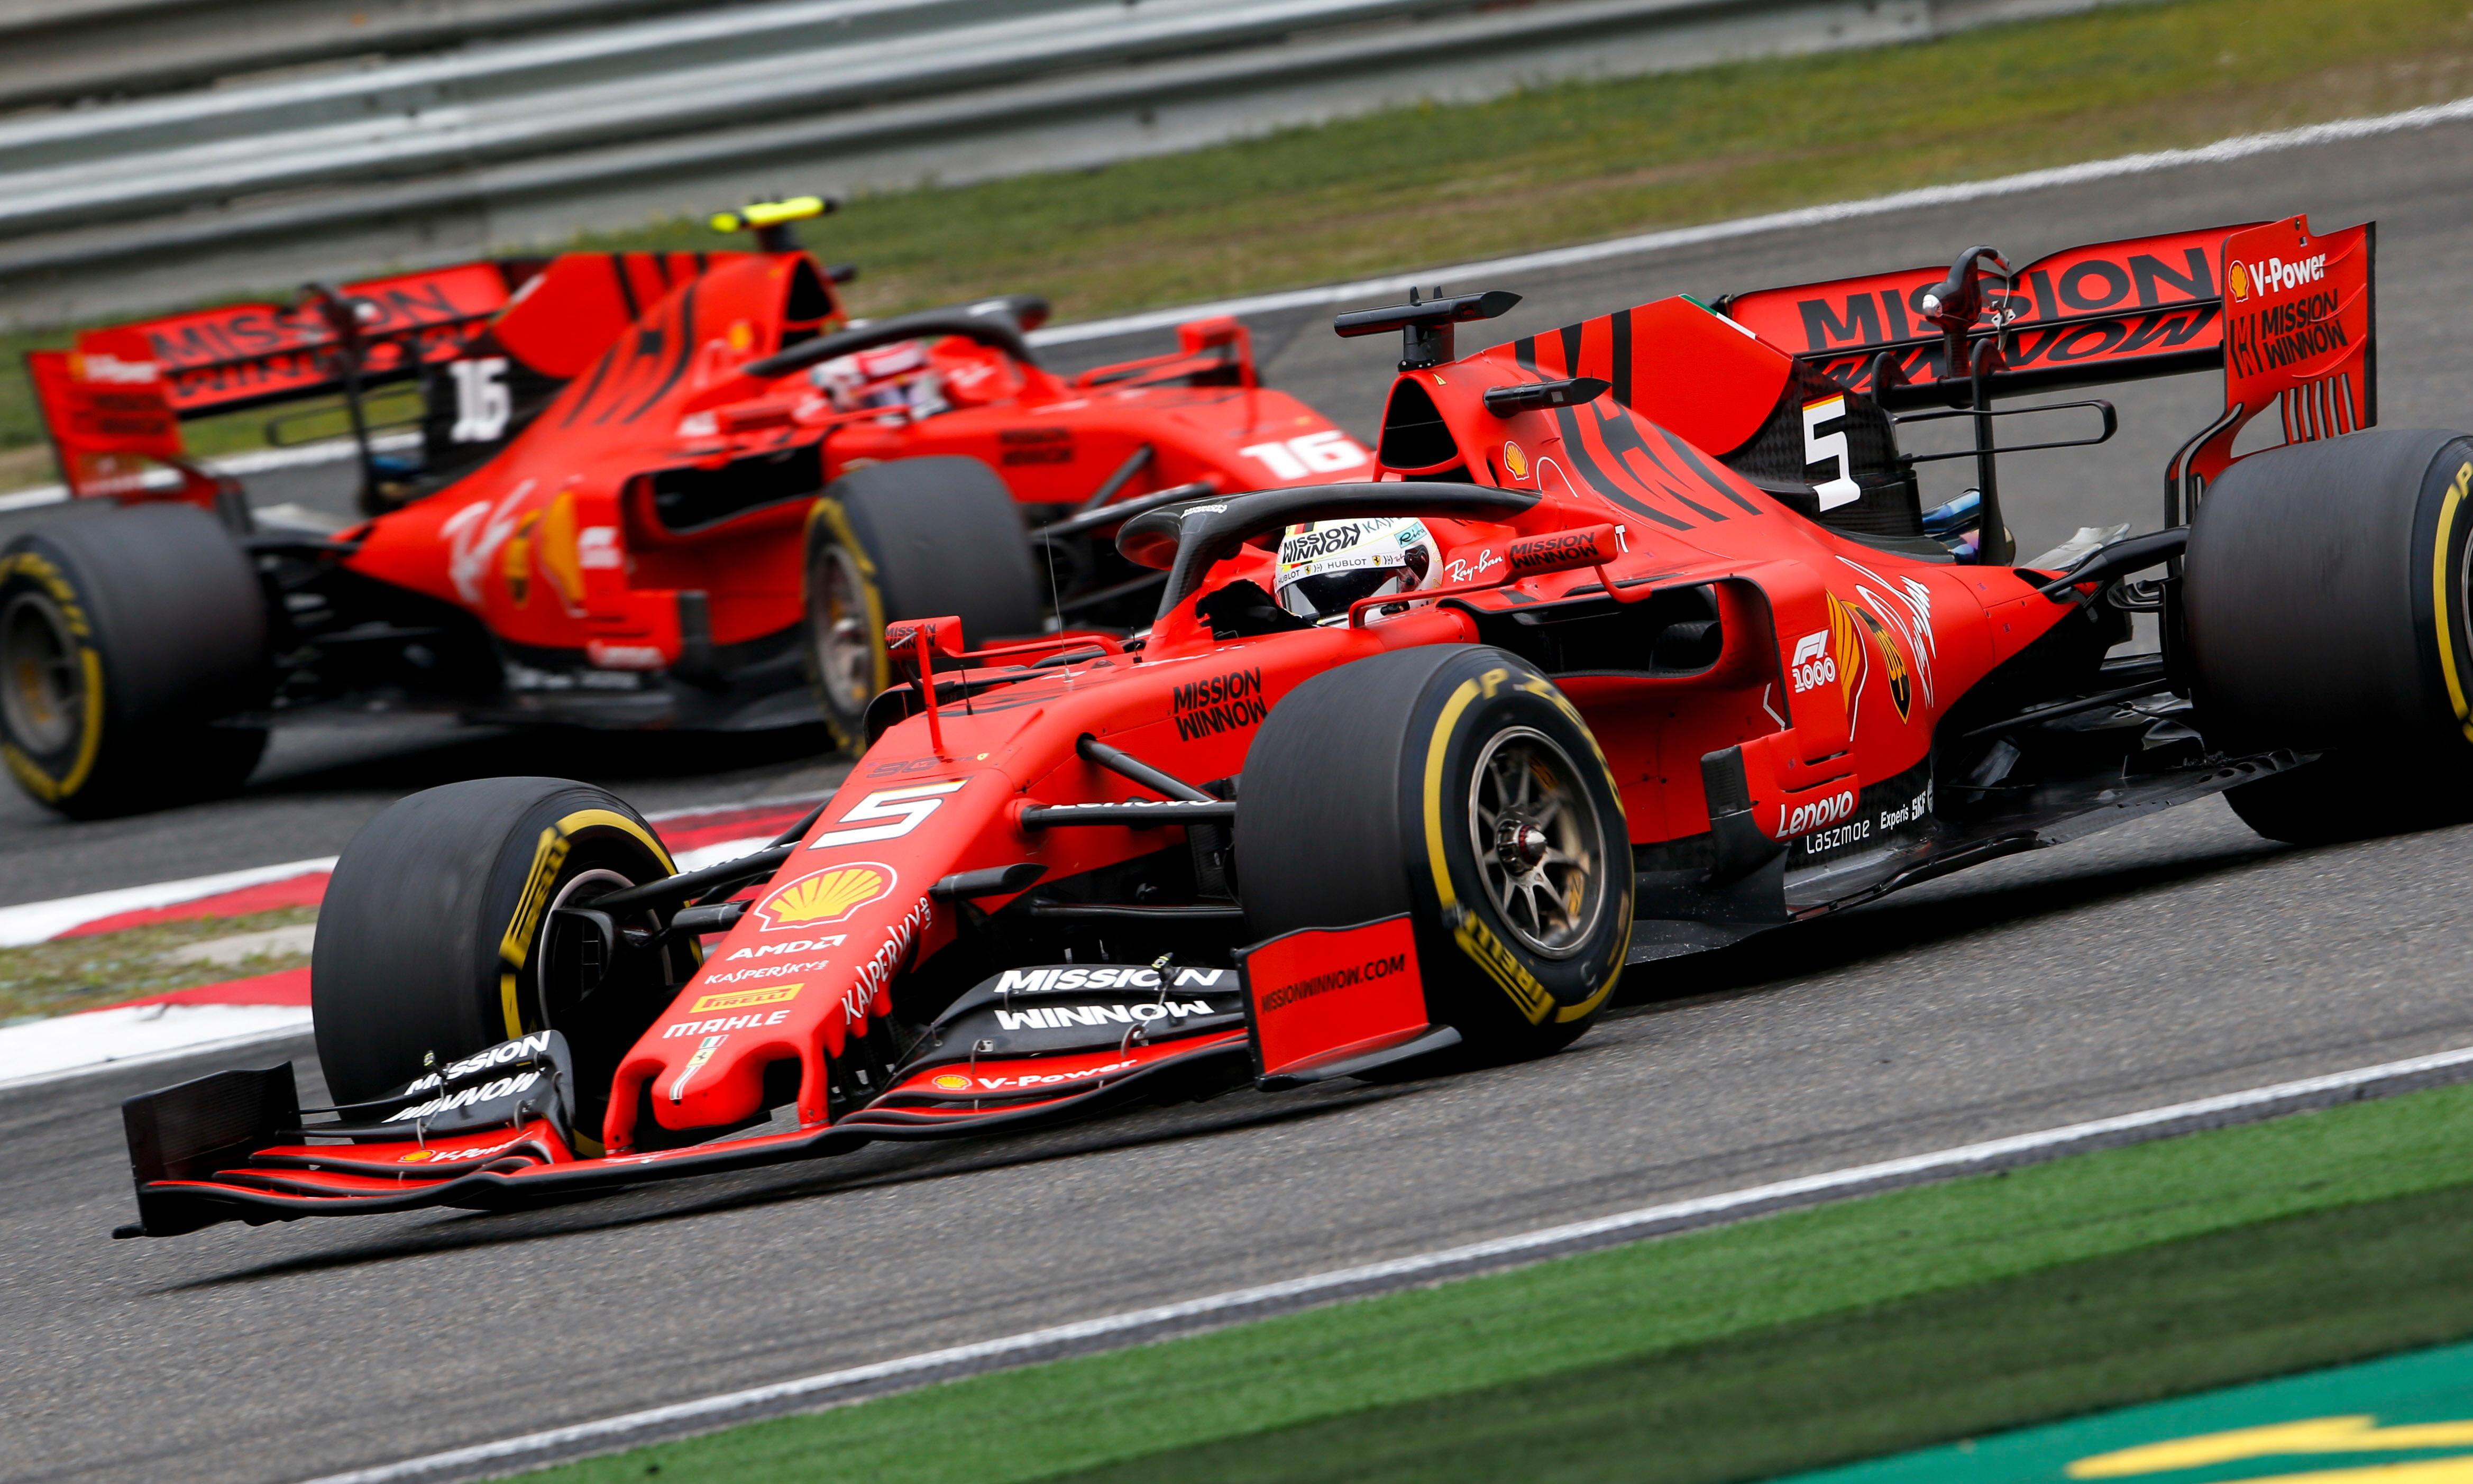 Charles Leclerc forces new dynamic to give Ferrari a team orders headache